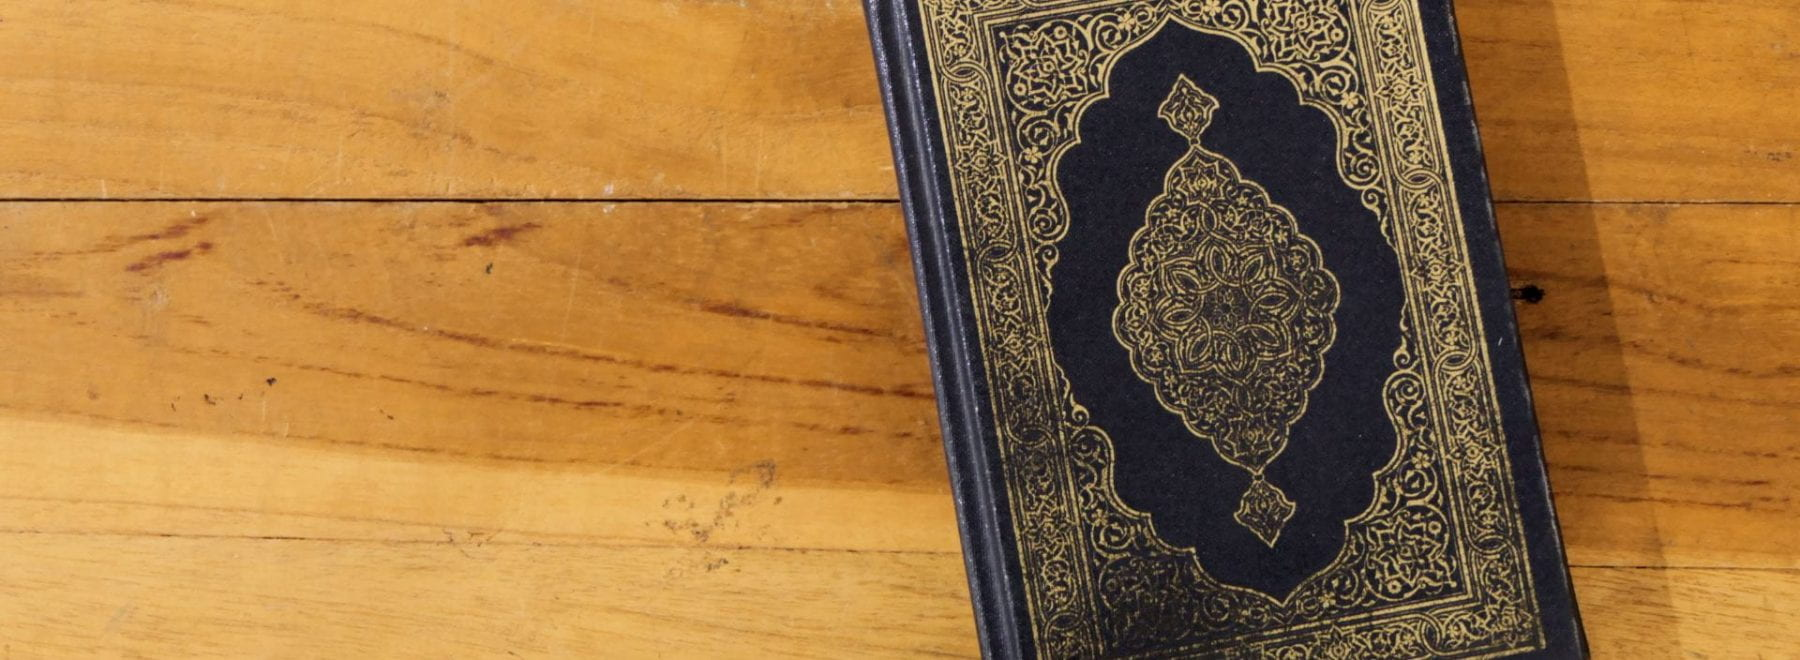 decorated book